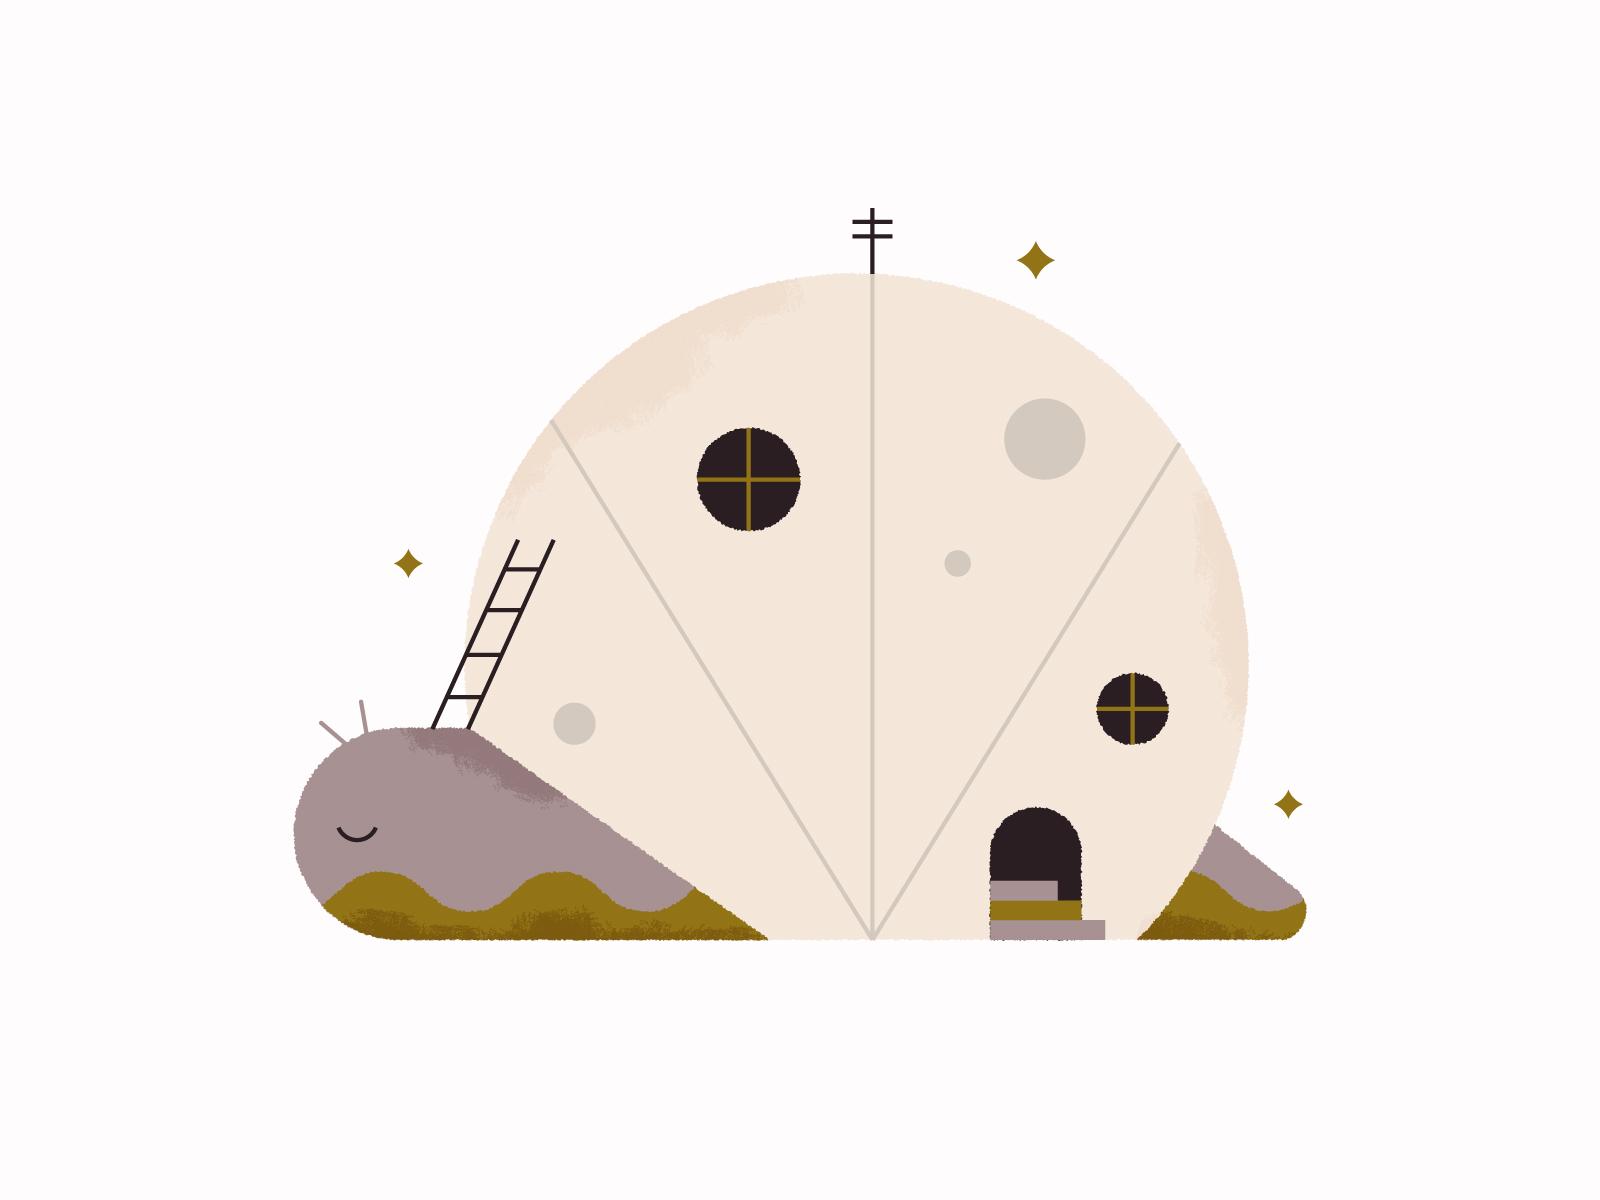 Snail House 🐌 shell design image blog art illustration fun cute home house snail